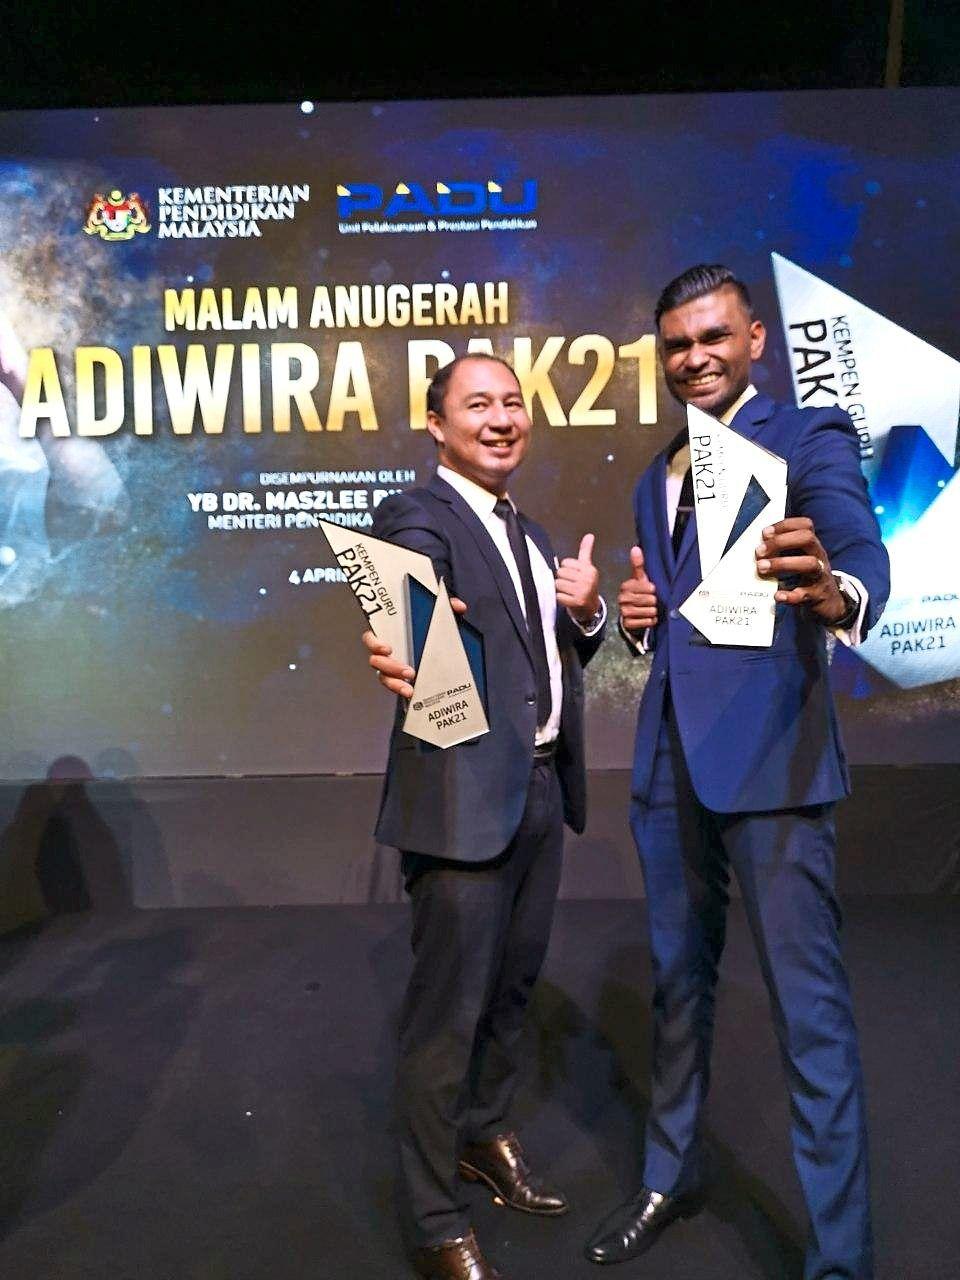 Teaching with pride: Norhailmi (left) and Samuel receiving their Guru Adiwira award last year.